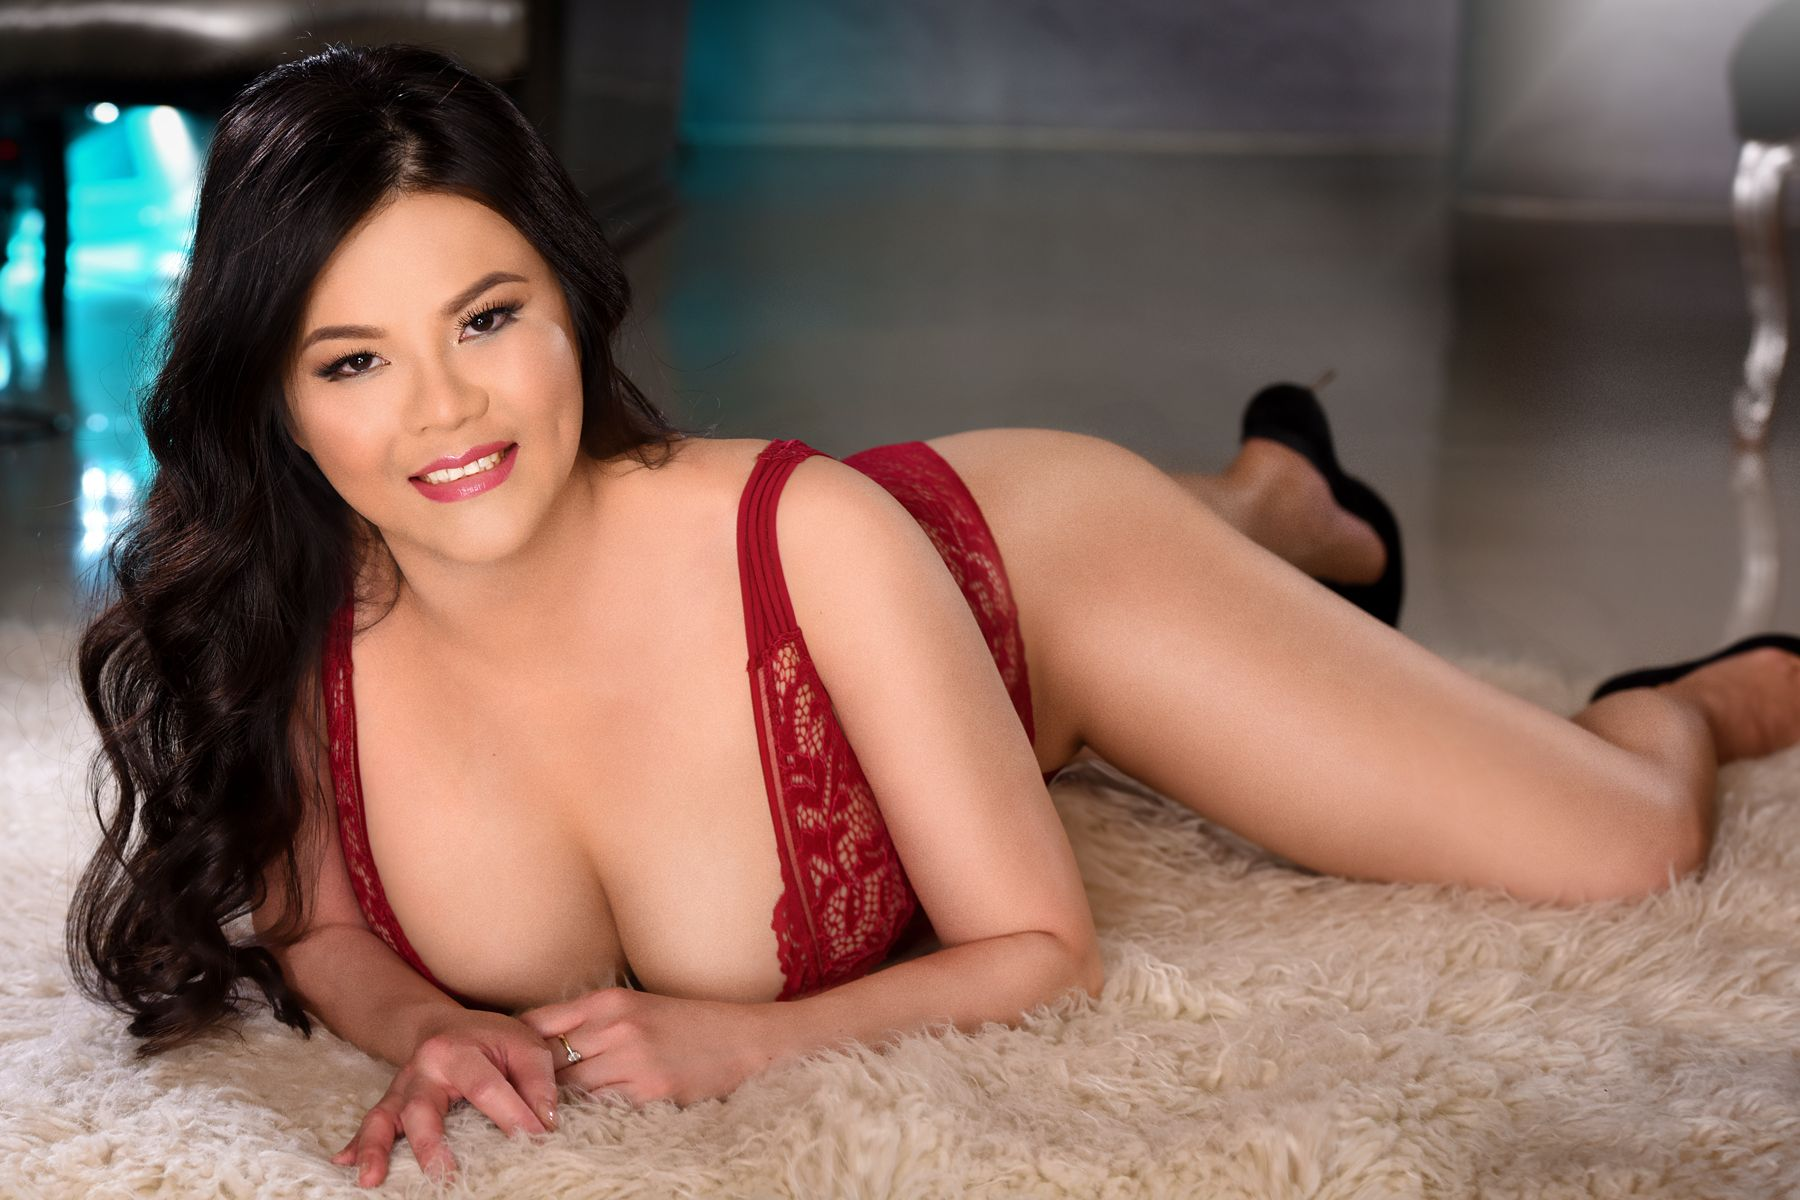 Northern ireland escorts erotic massage